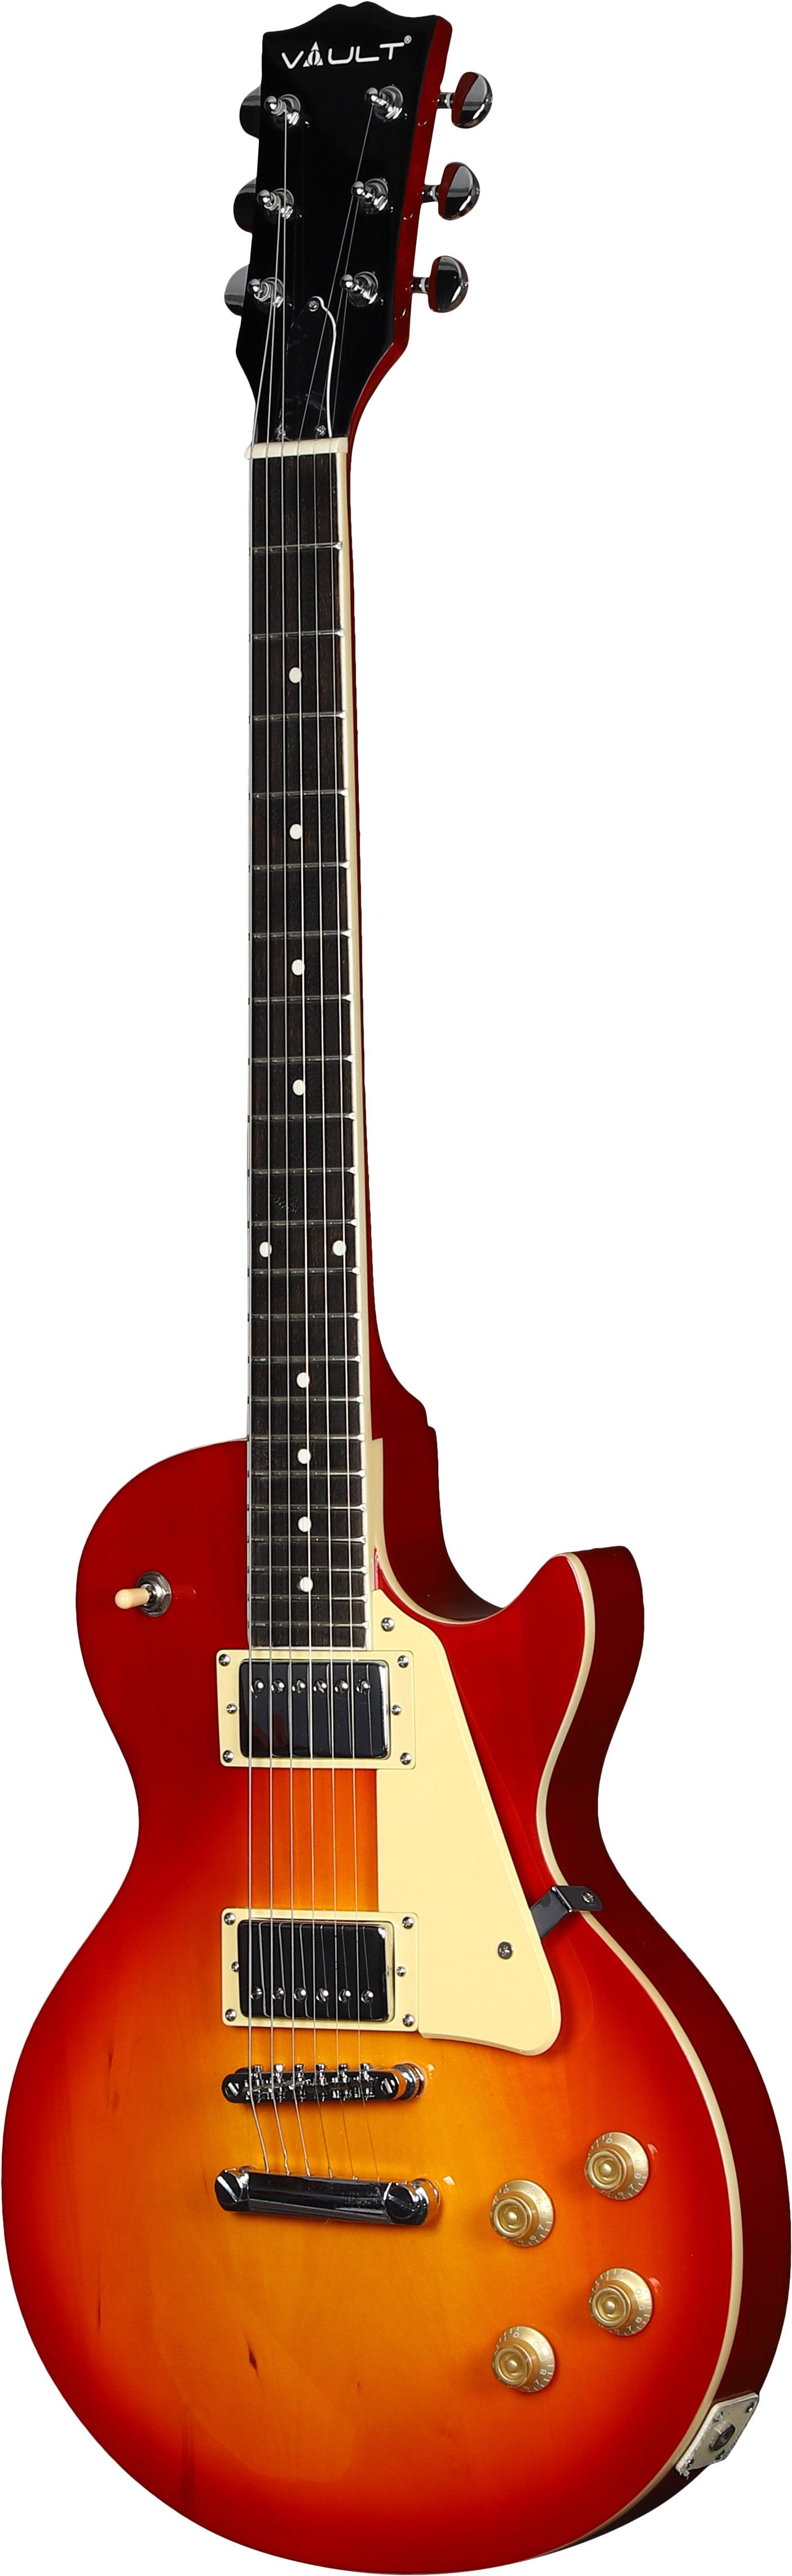 Vault-LP1-Ovangkol-Fretboard-Electric-Guitar-Cherry-Red-Burst-w-Amplifier thumbnail 4